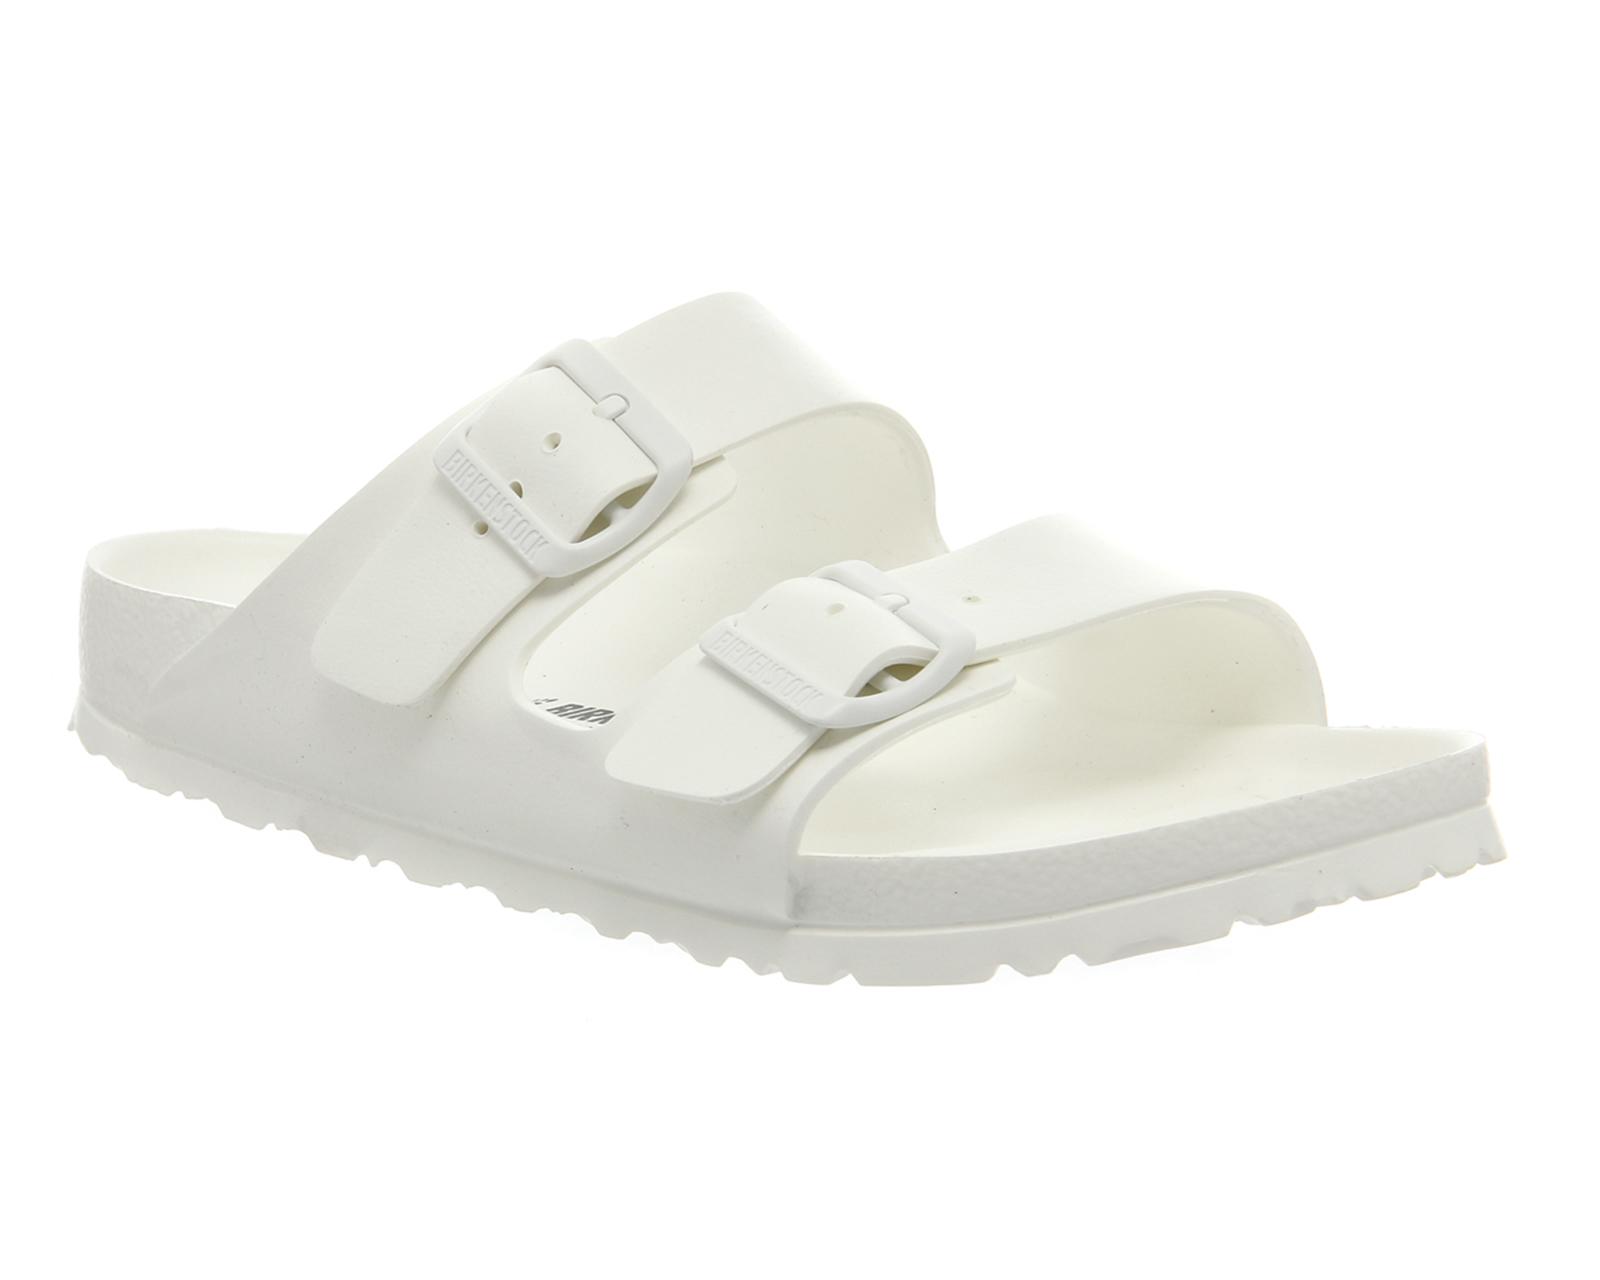 Birkenstock Madrid EVA Slim White, Schuhe, Sandalen & Hausschuhe, Sandalen, Weiß, Female, 36